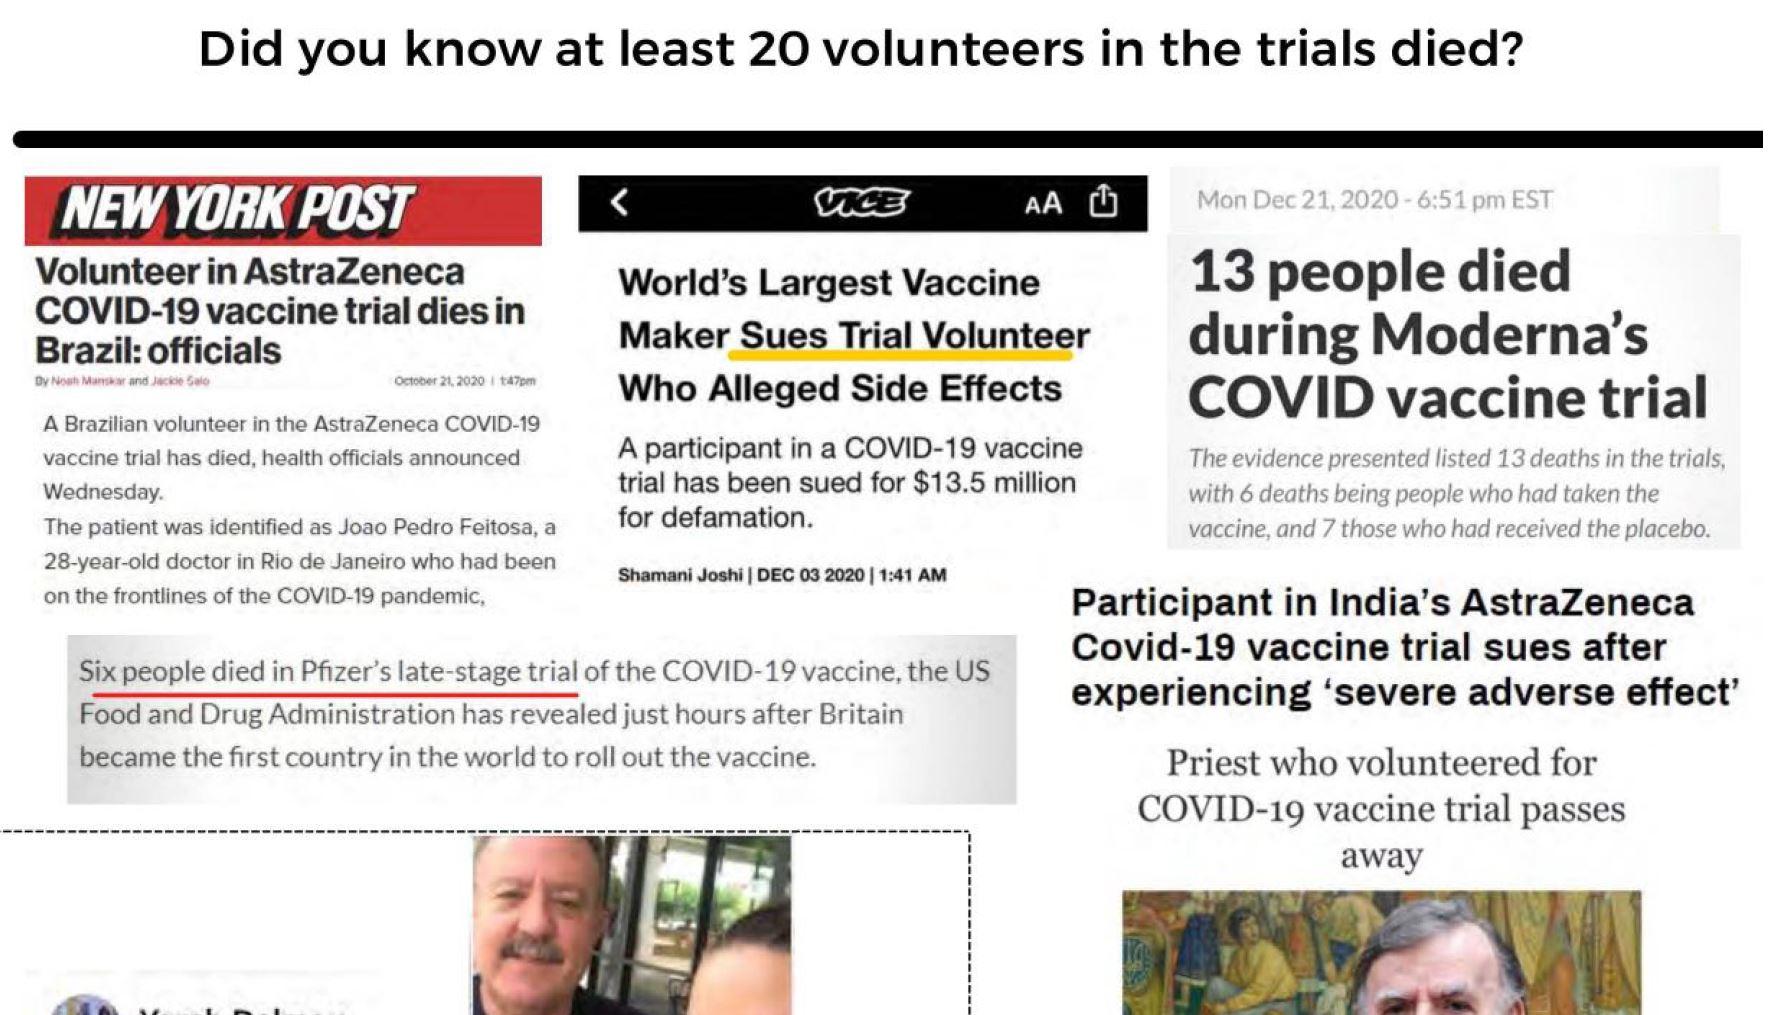 COVID TRIAL DEATHS